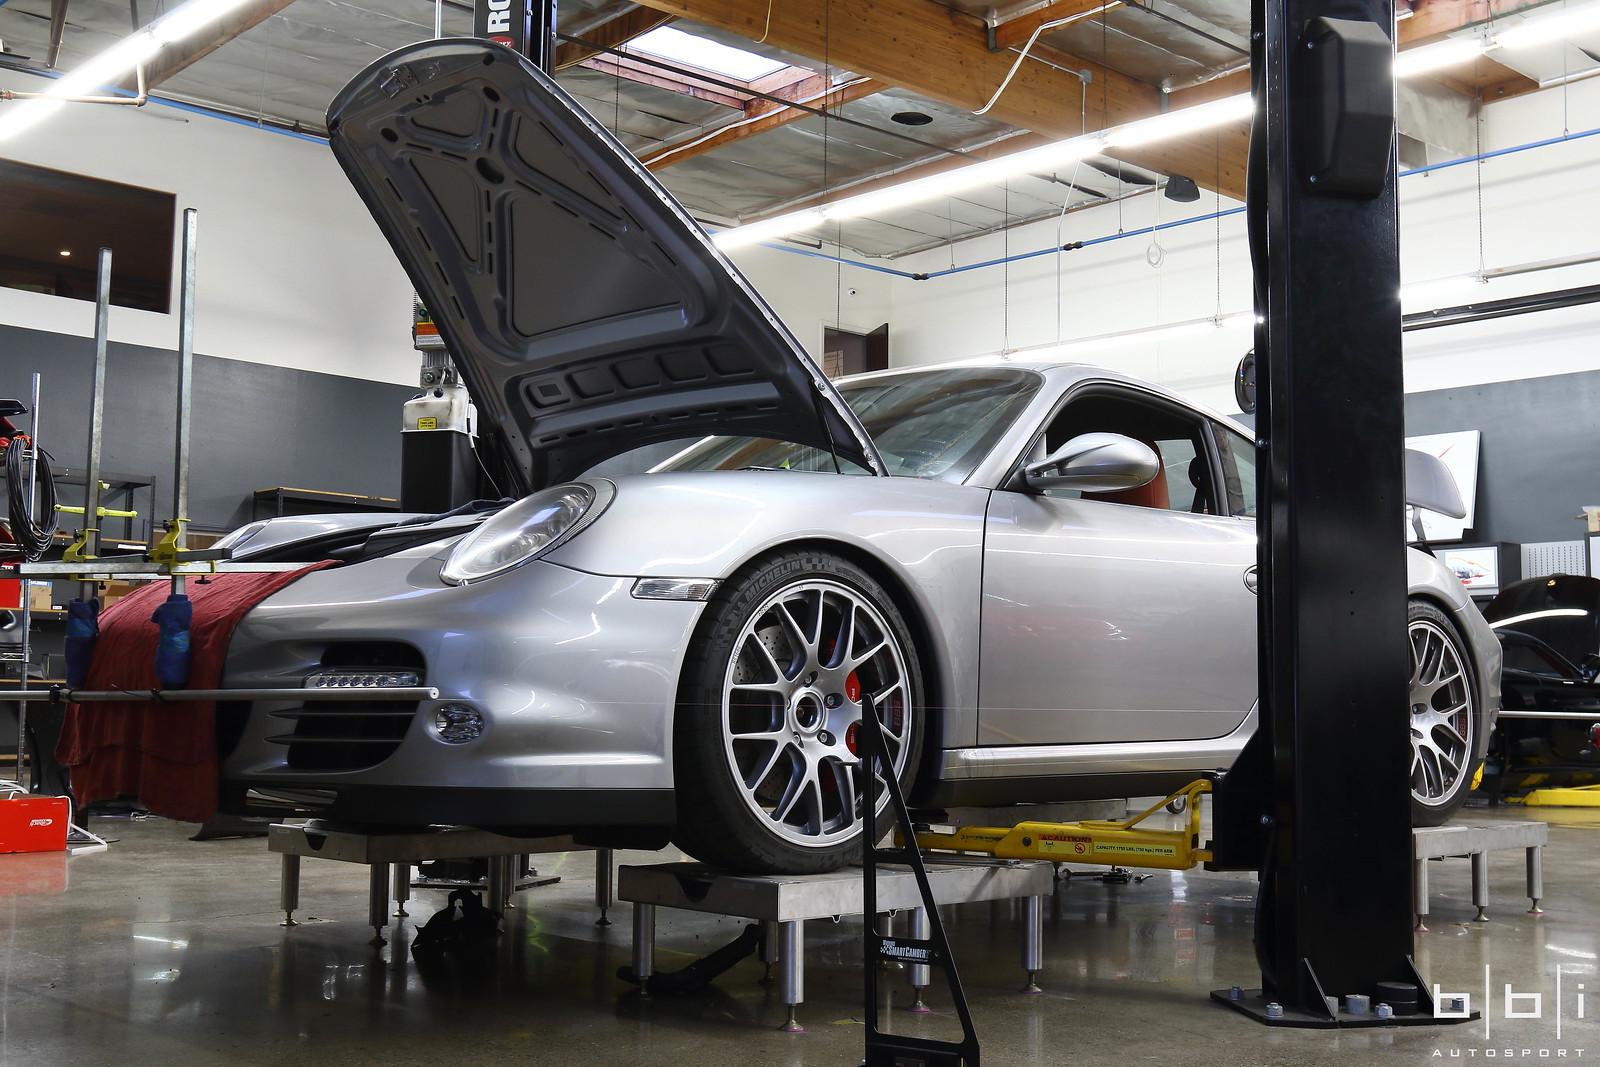 Porsche 997 2 Turbo 6 Speed Bbi Exhaust Amp Lowering Springs